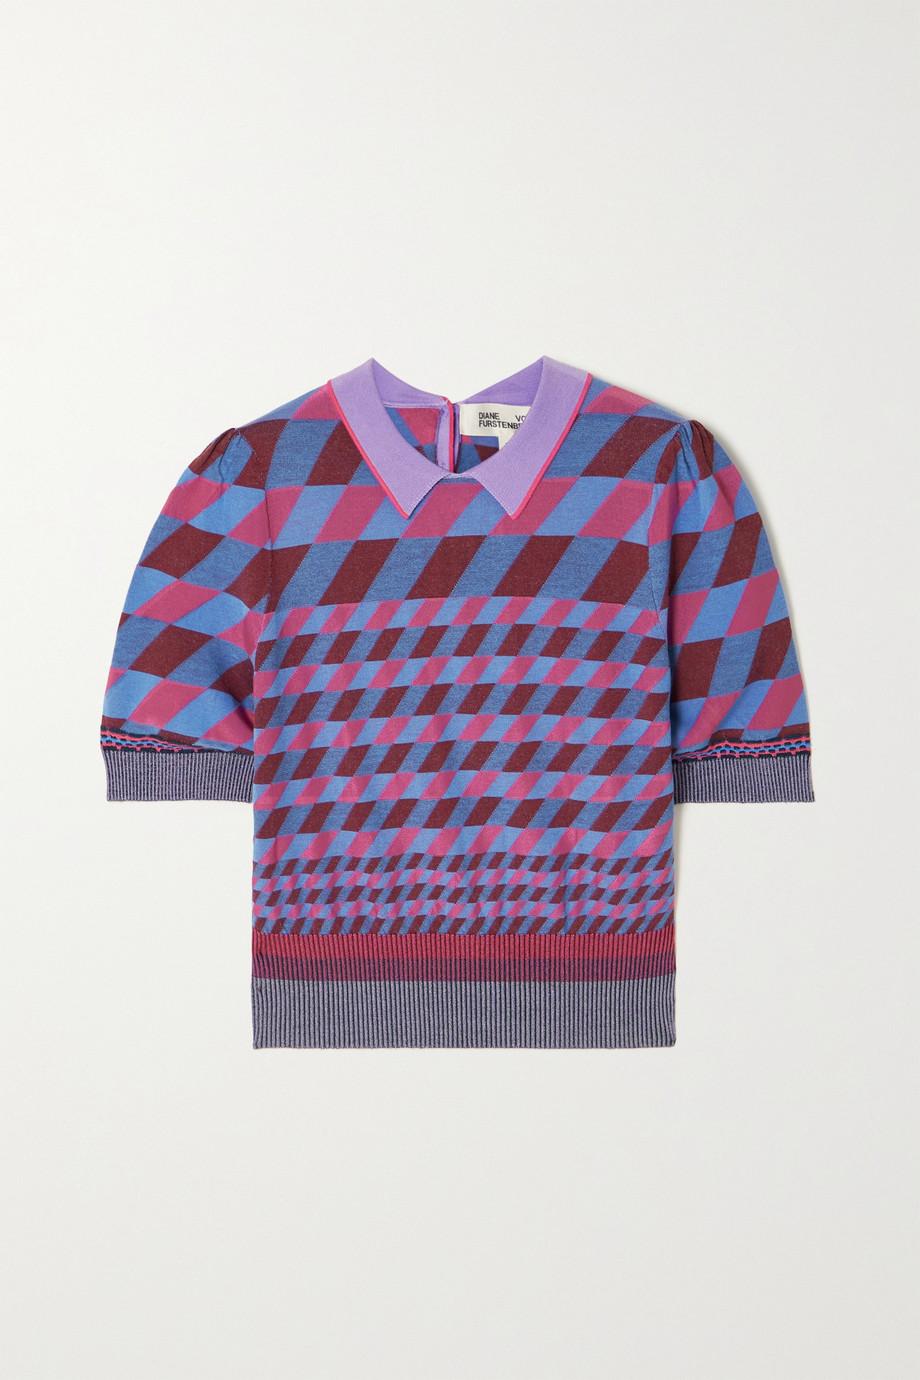 Diane von Furstenberg Jenny printed stretch-knit top